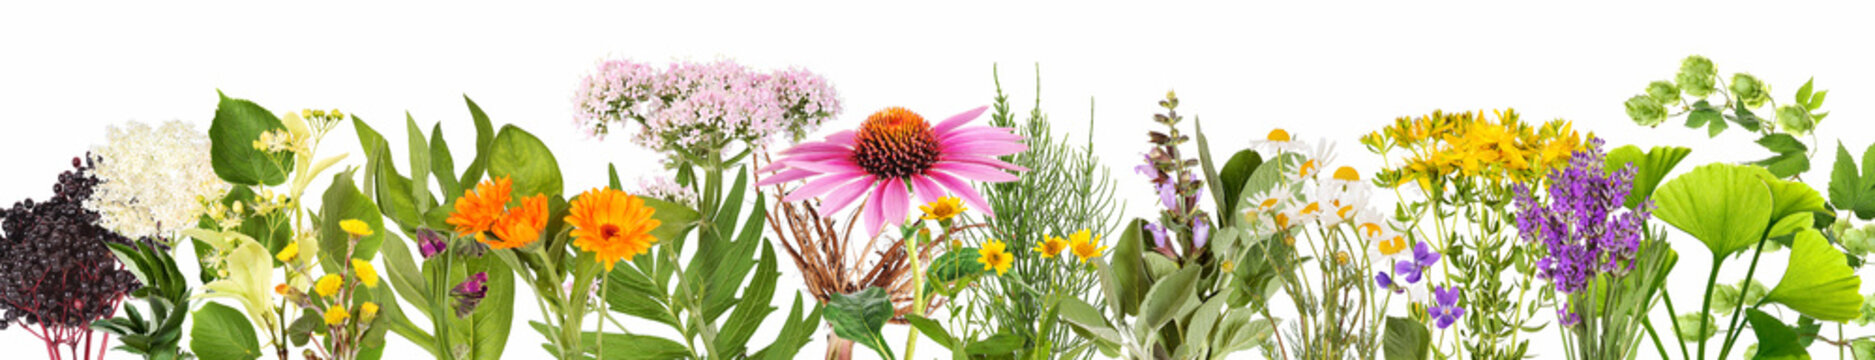 Various medical plants